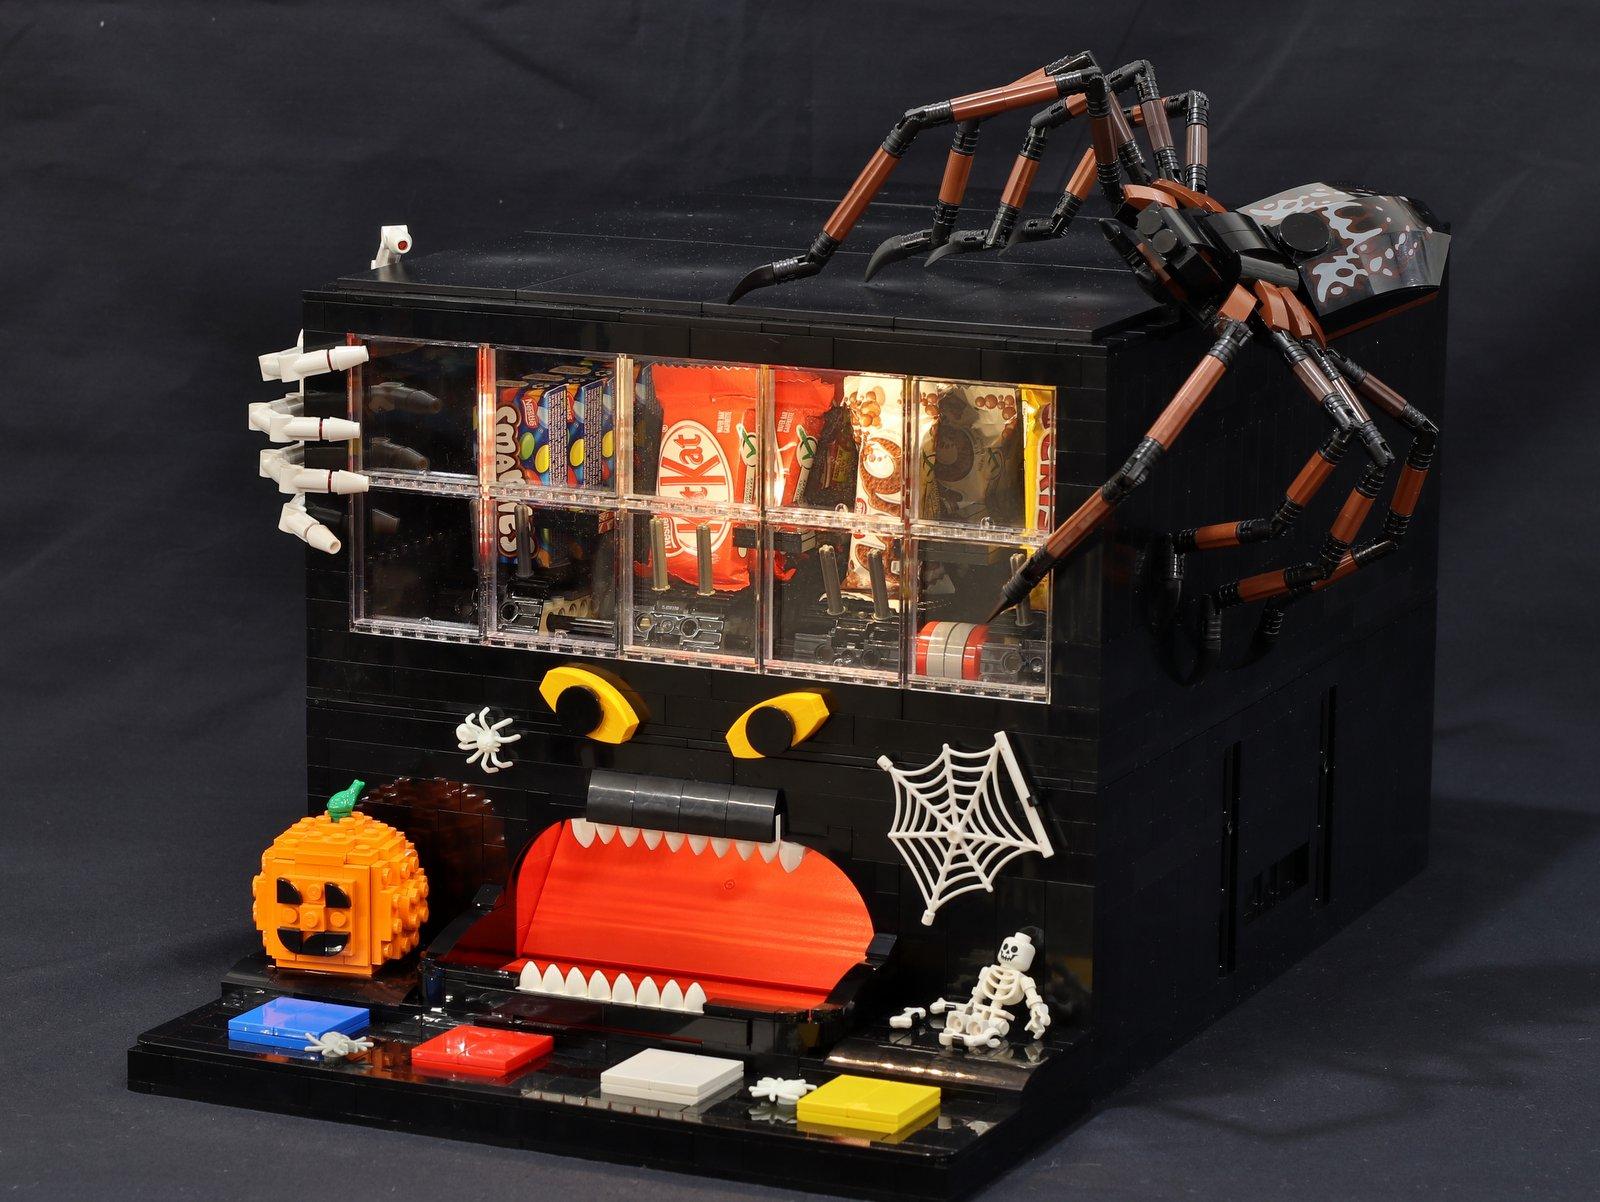 lego-schokoladen-automat-jkbrickworks zusammengebaut.com